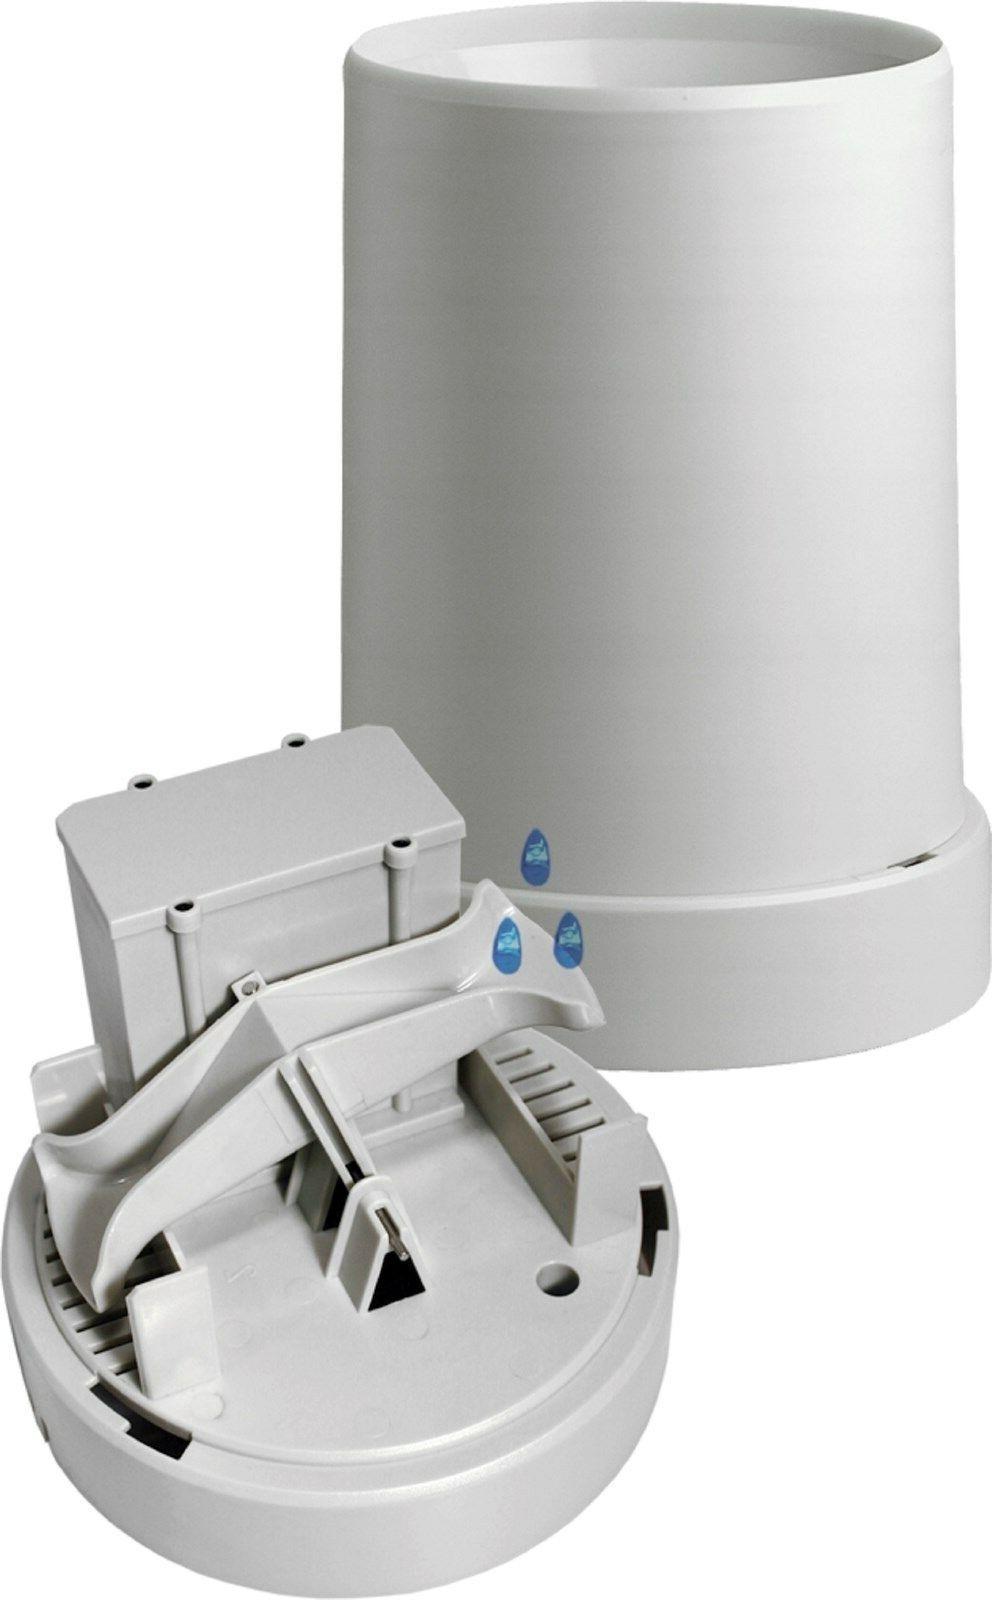 C84612 La Crosse Wireless with